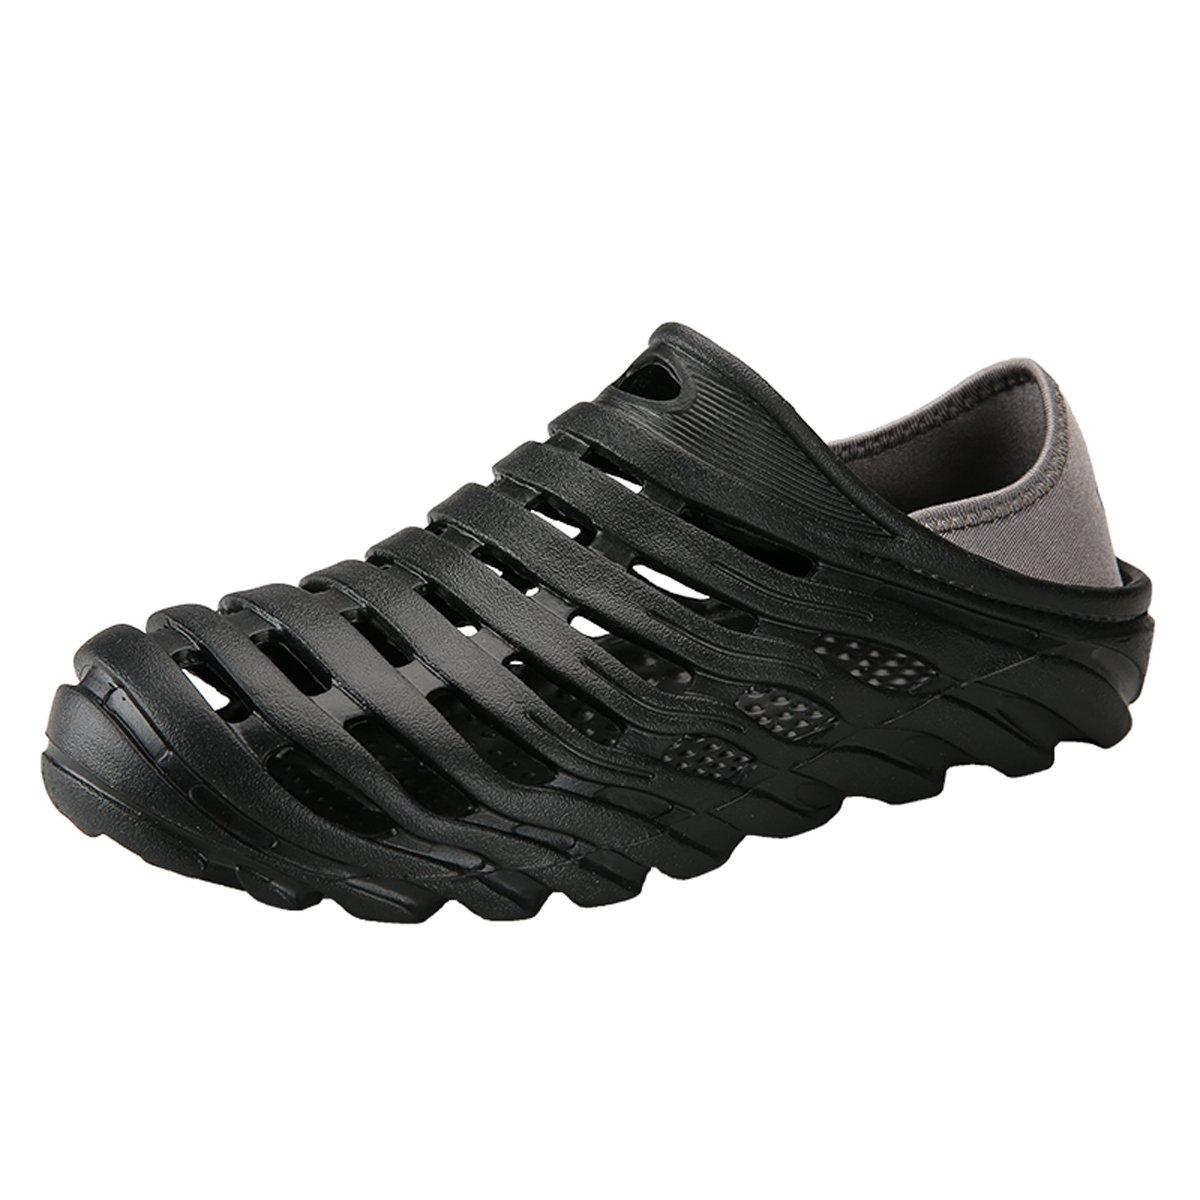 RARKOR Garden Shoes Men's Ultralight Hollow Summer Aqua Breathable Comfort Slippers Outdoor Unisex Water Shoes Black 45